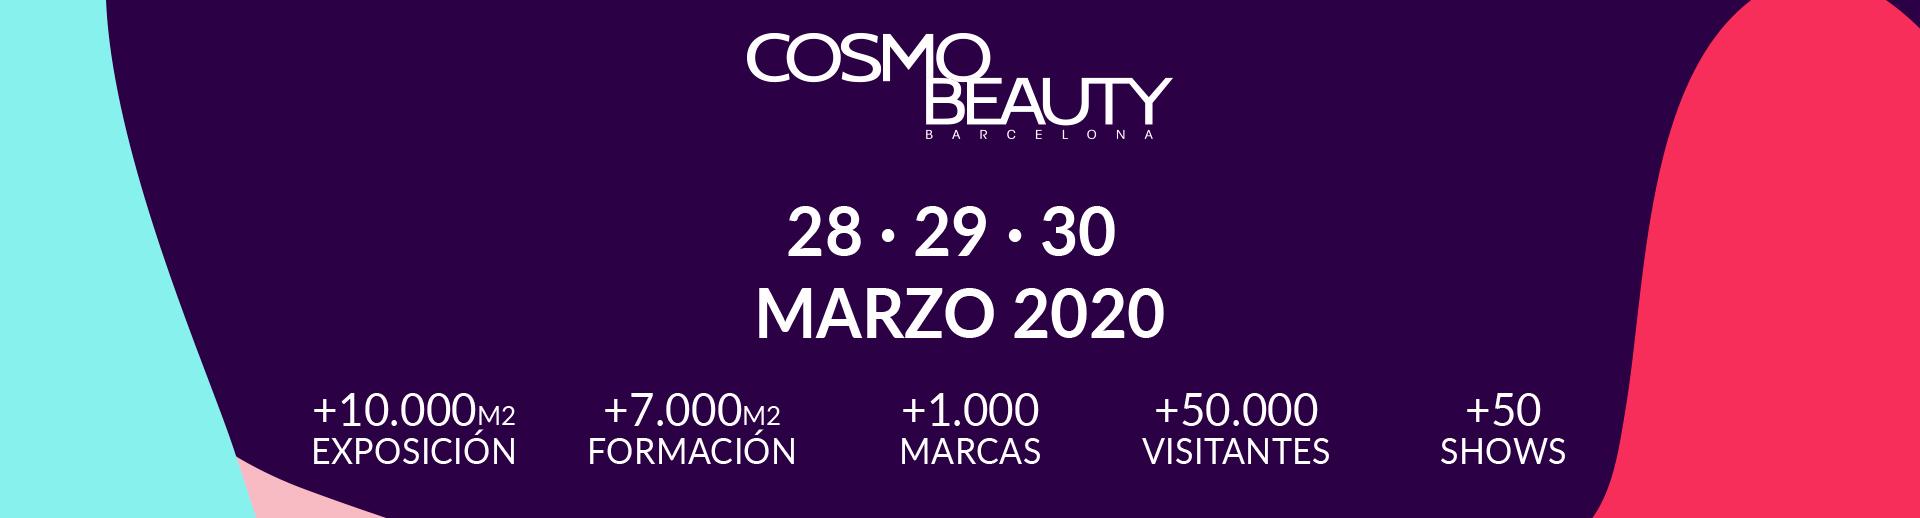 Cosmobeauty Barcelona Cifras